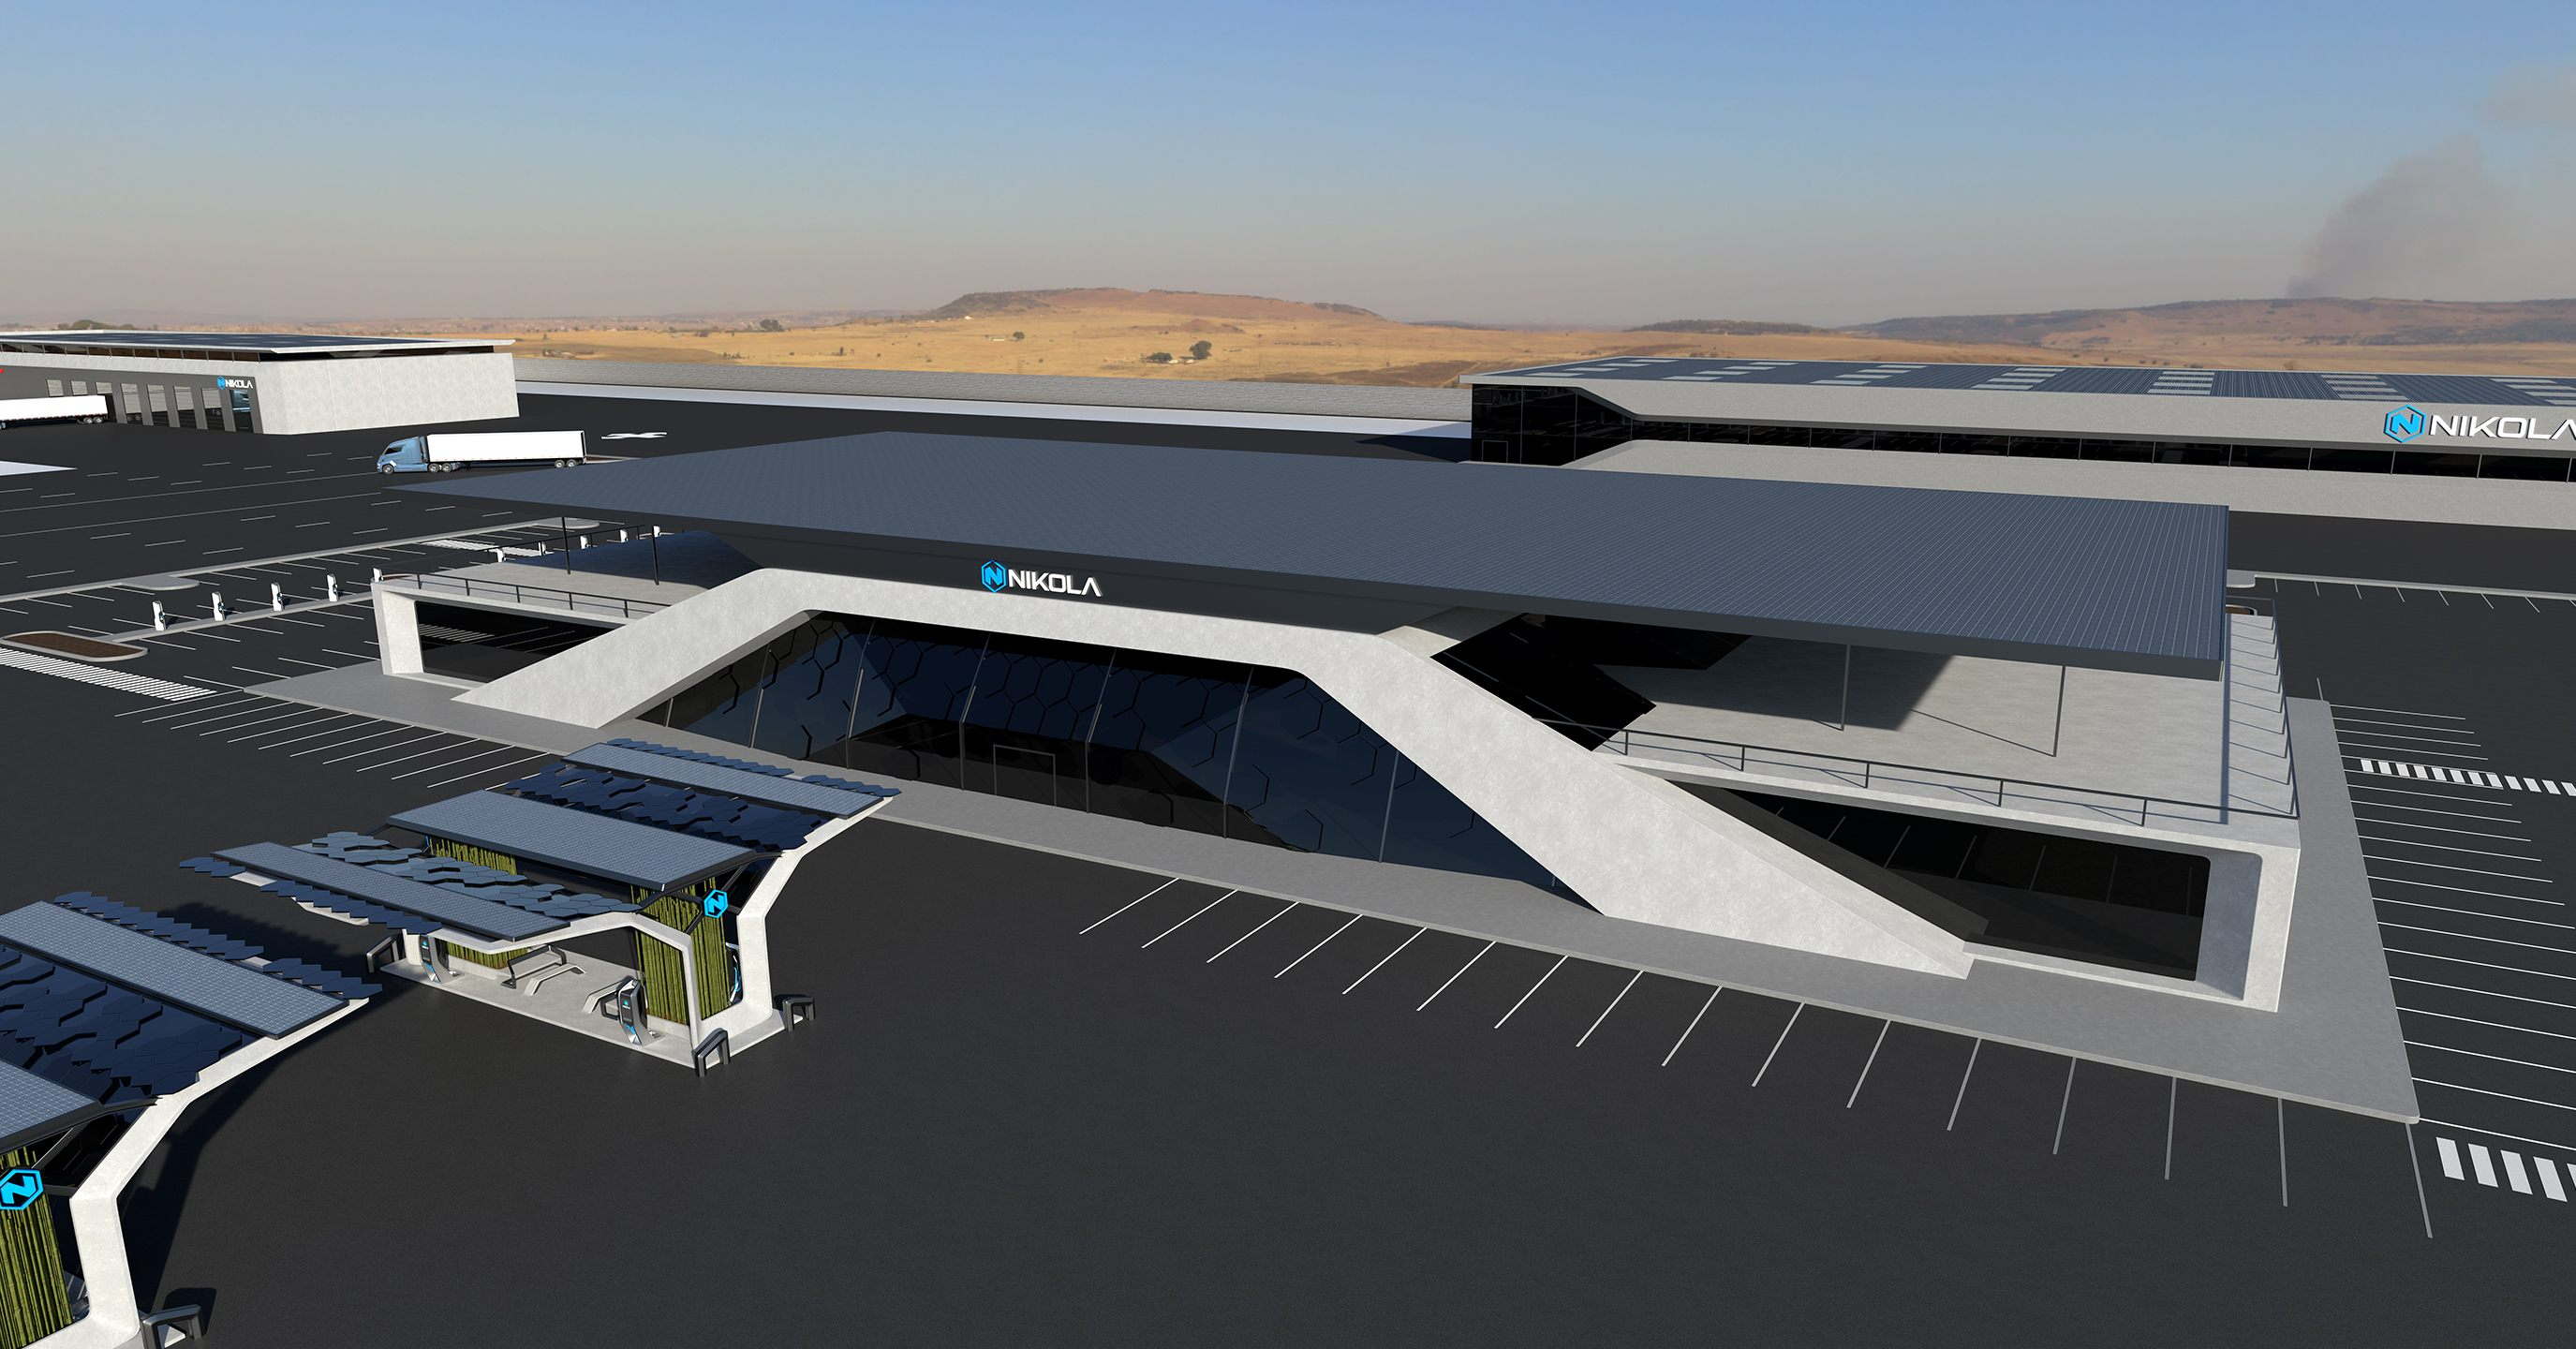 Nikola hydrogen station building